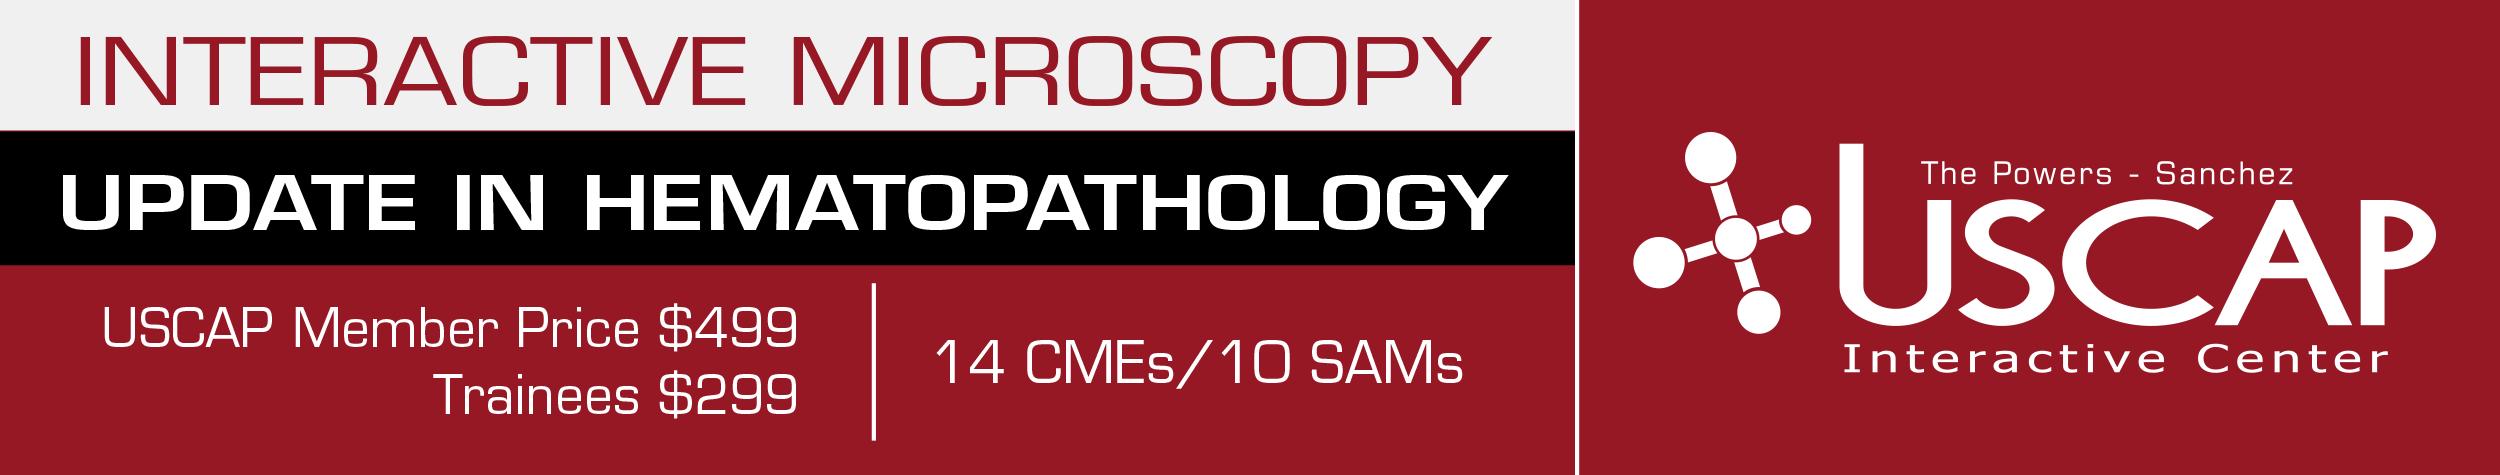 Interactive Microscopy: April 8 - 9, 2017